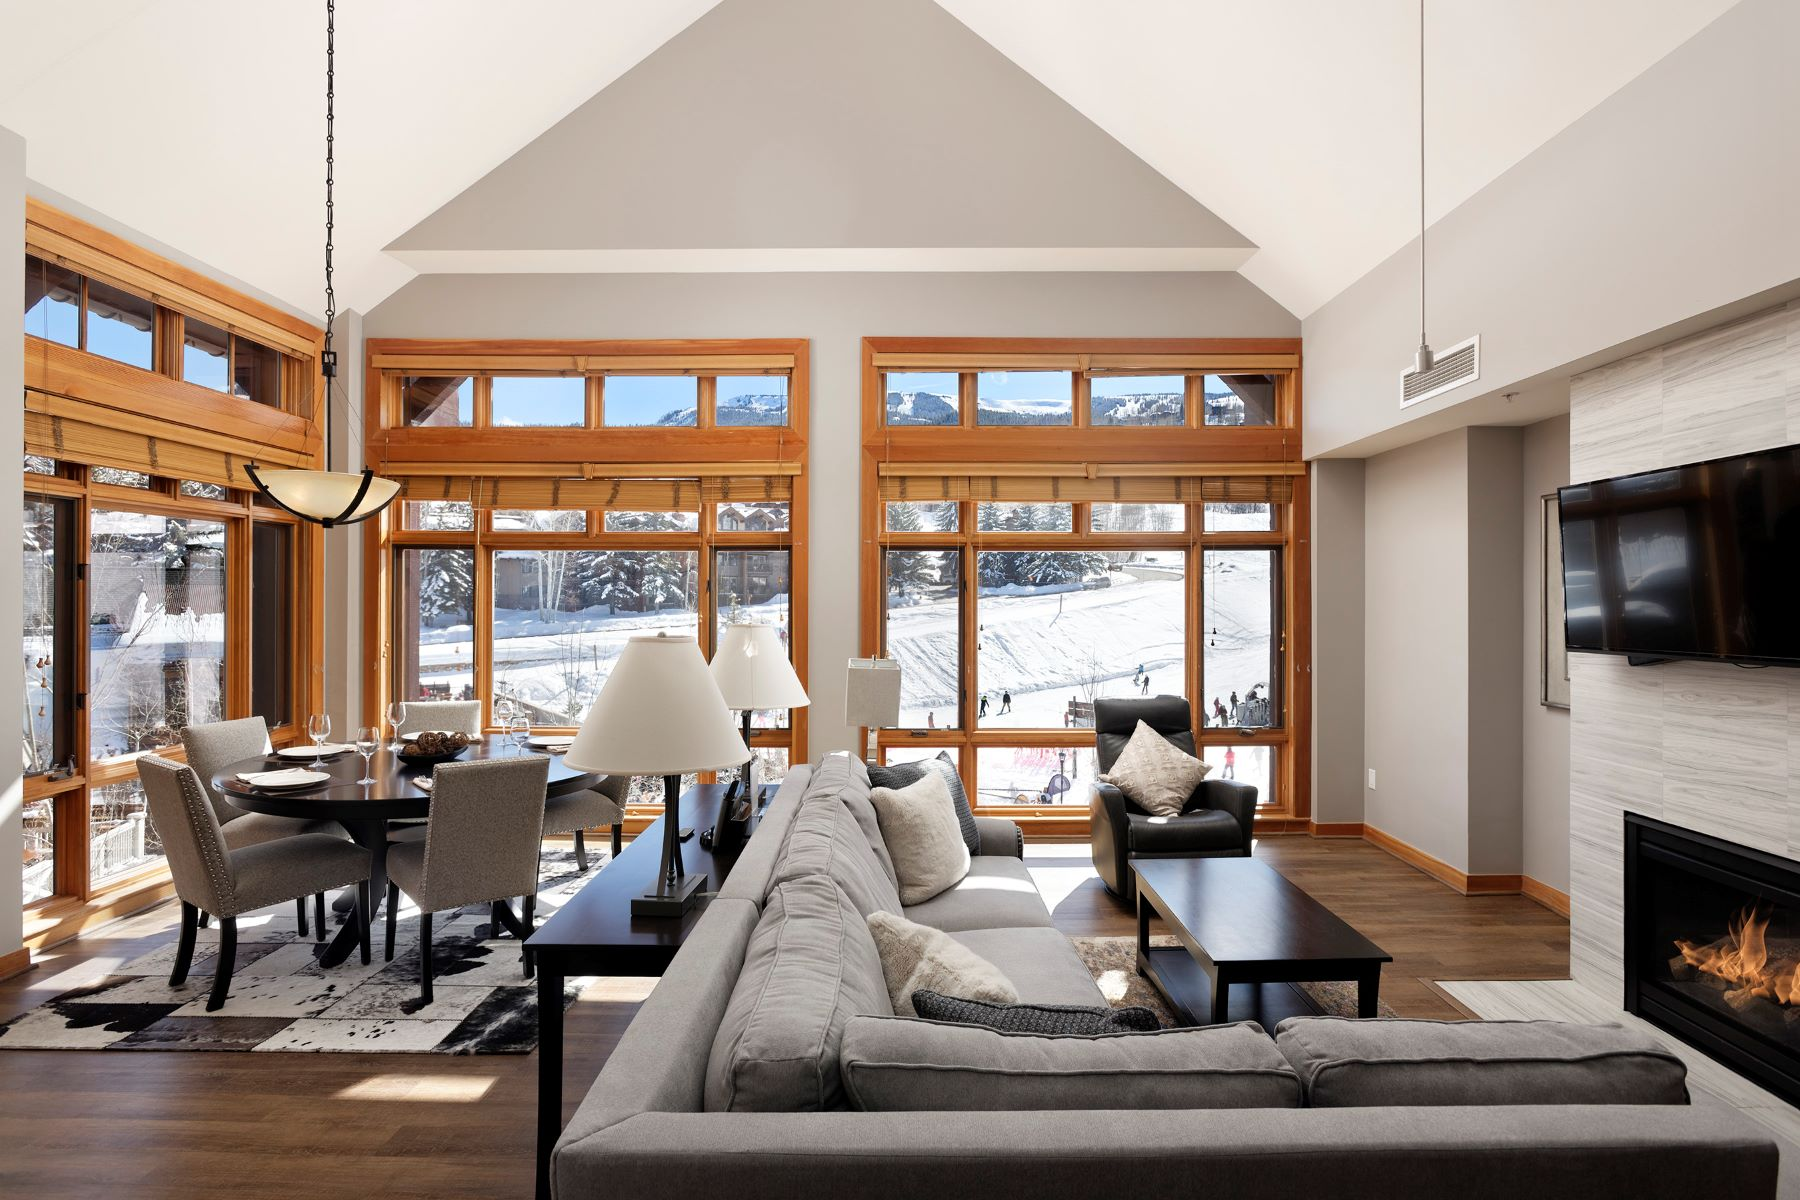 Apartments для того Продажа на Capitol Peak Lodge 110 Carriage Way, 3404, Snowmass Village, Колорадо 81615 Соединенные Штаты